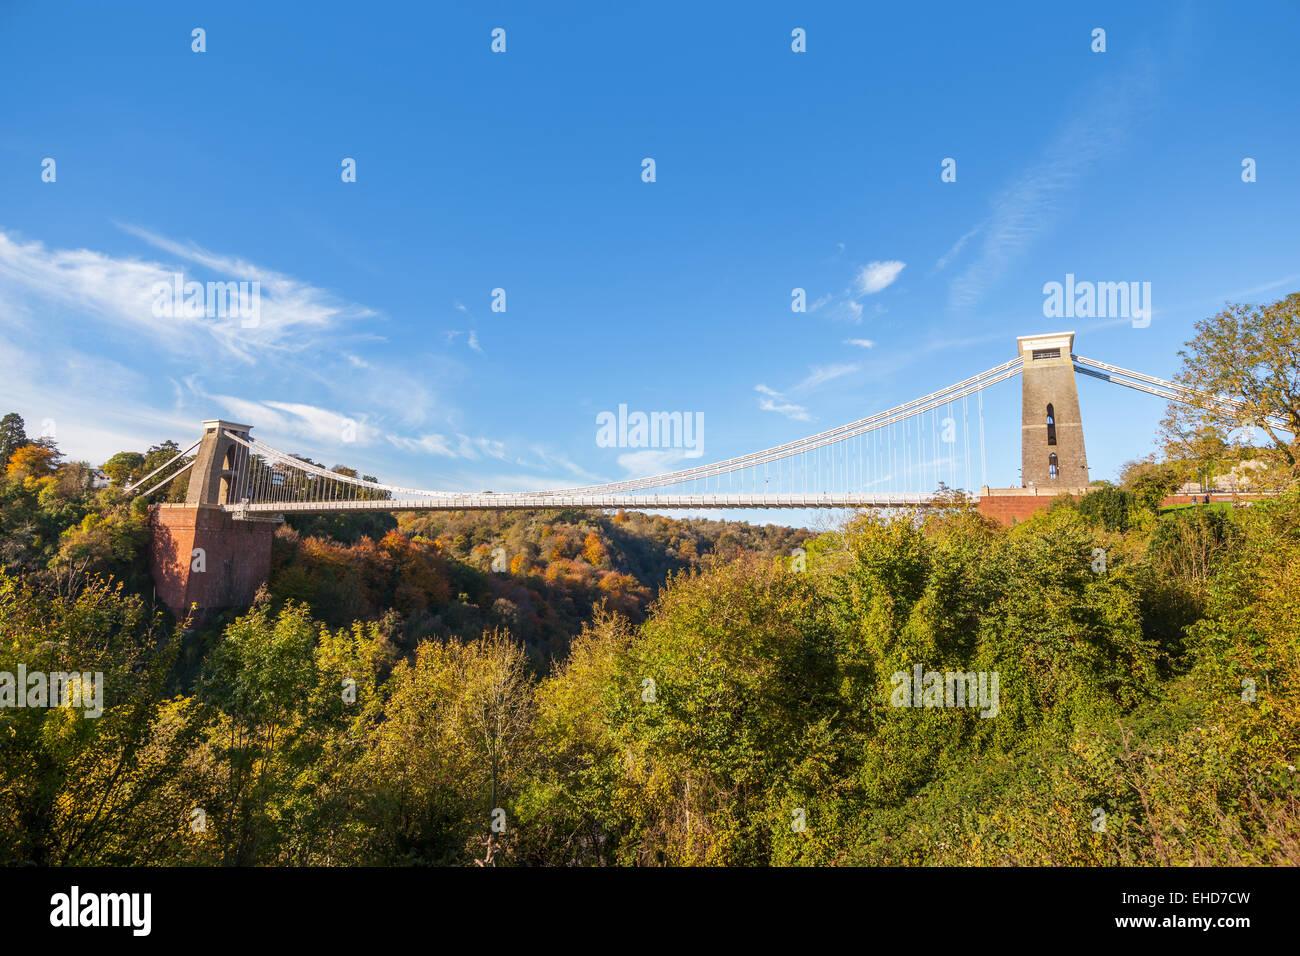 Wide view of Clifton Suspension Bridge in Bristol, England, UK Stock Photo